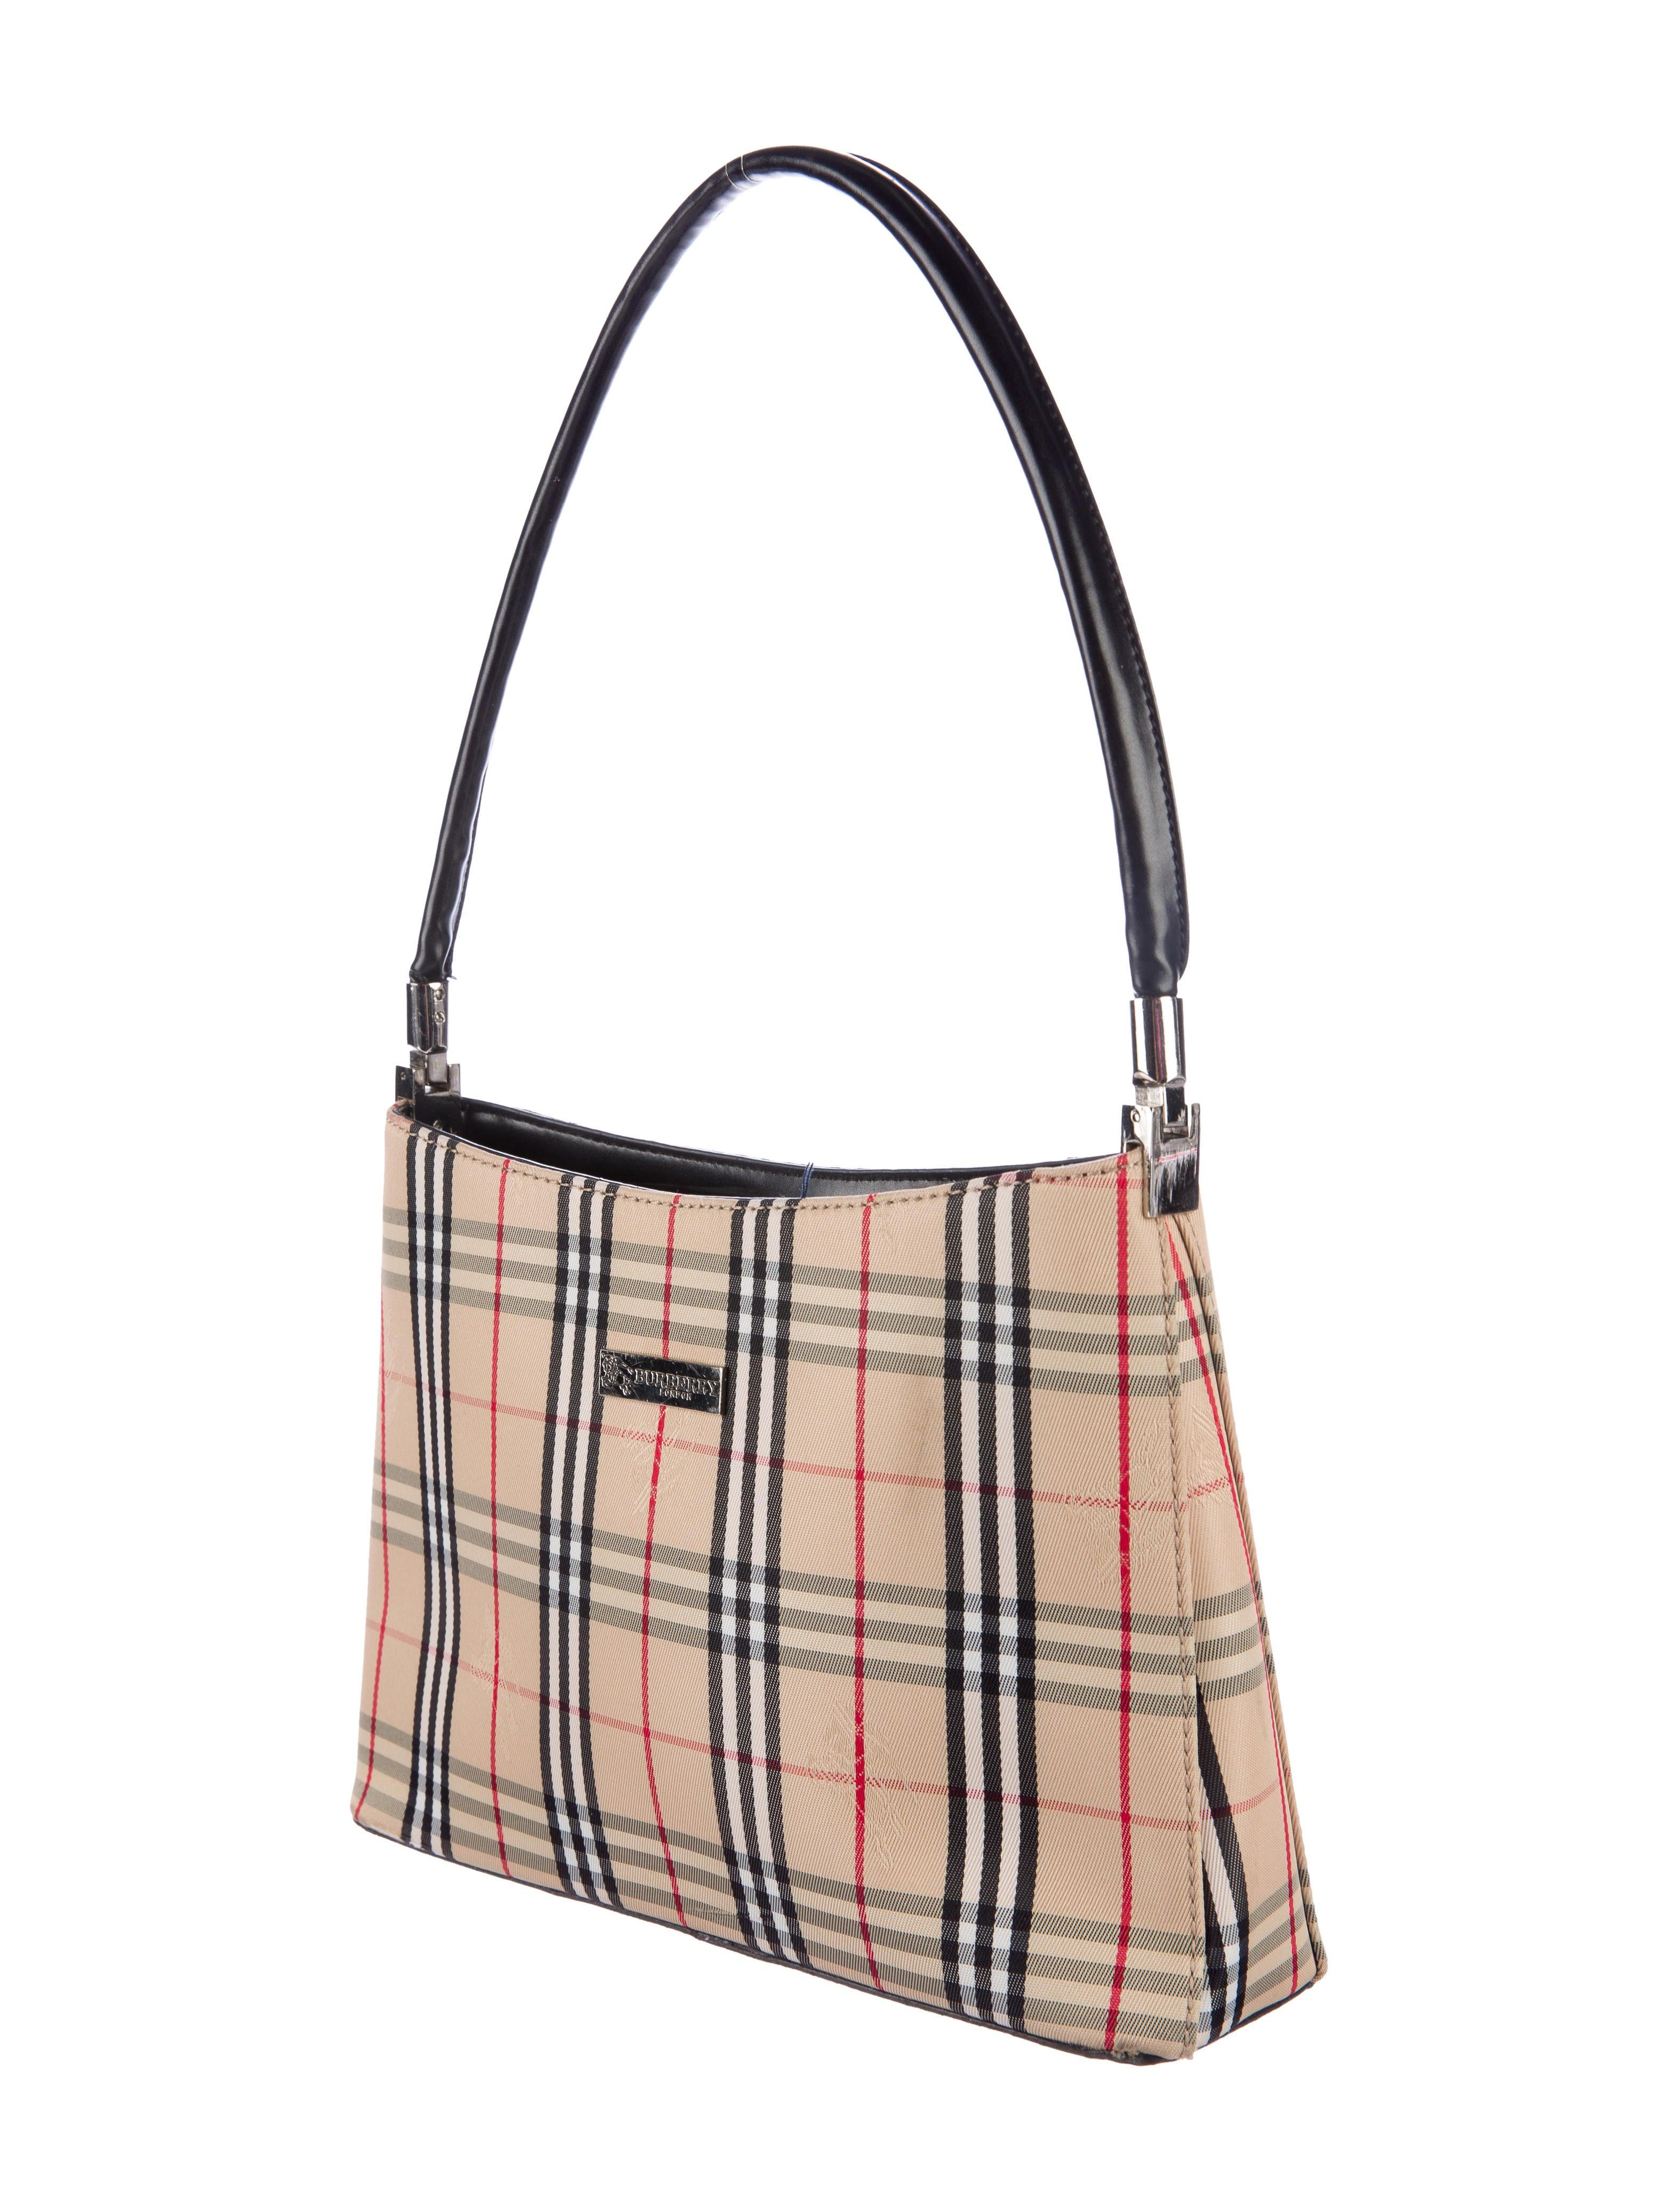 Burberry Haymarket Check Shoulder Bag Handbags